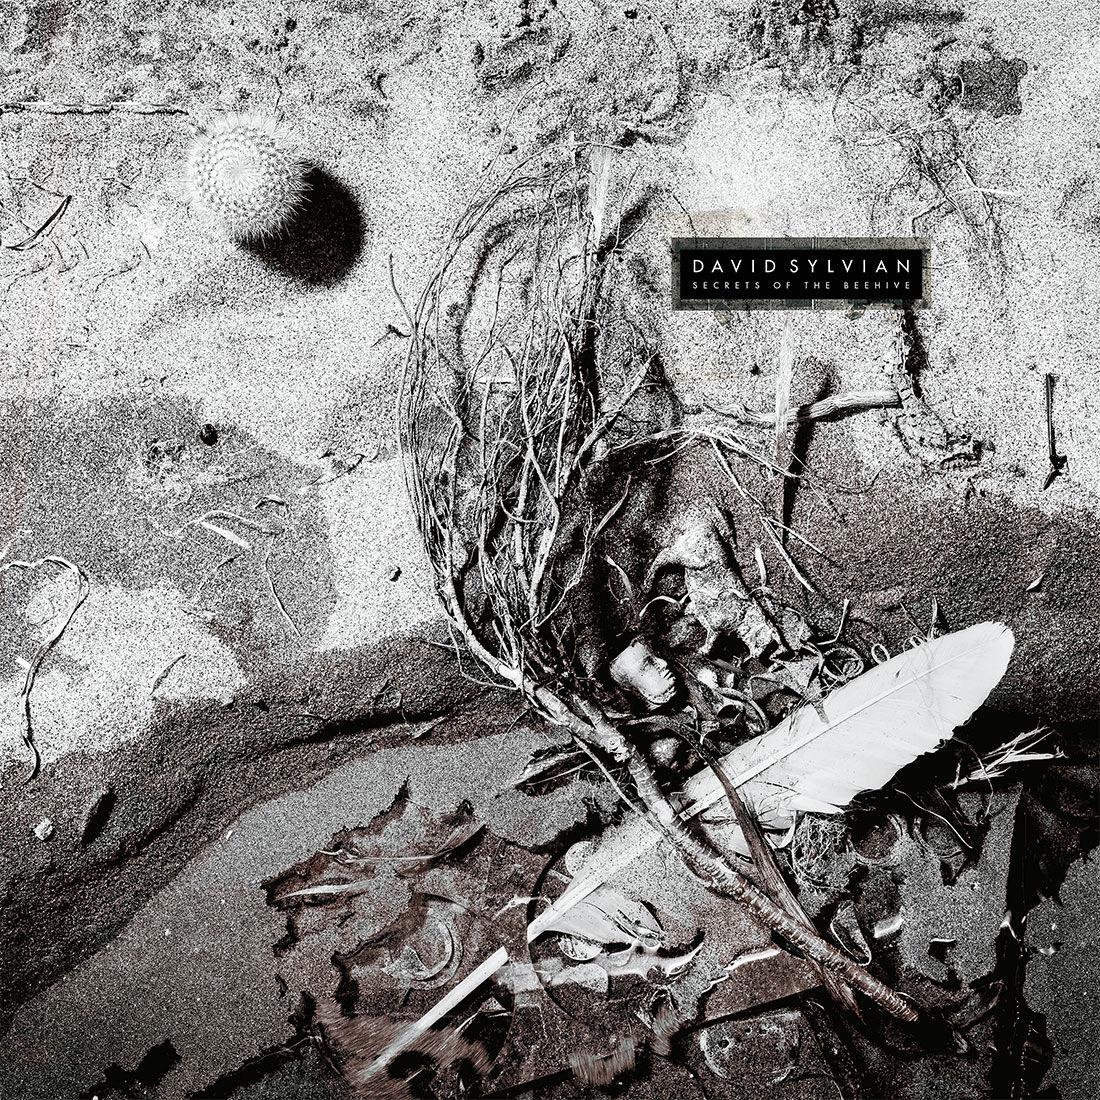 Secrets Of The Beehive 2019 Vinyl David Sylvian